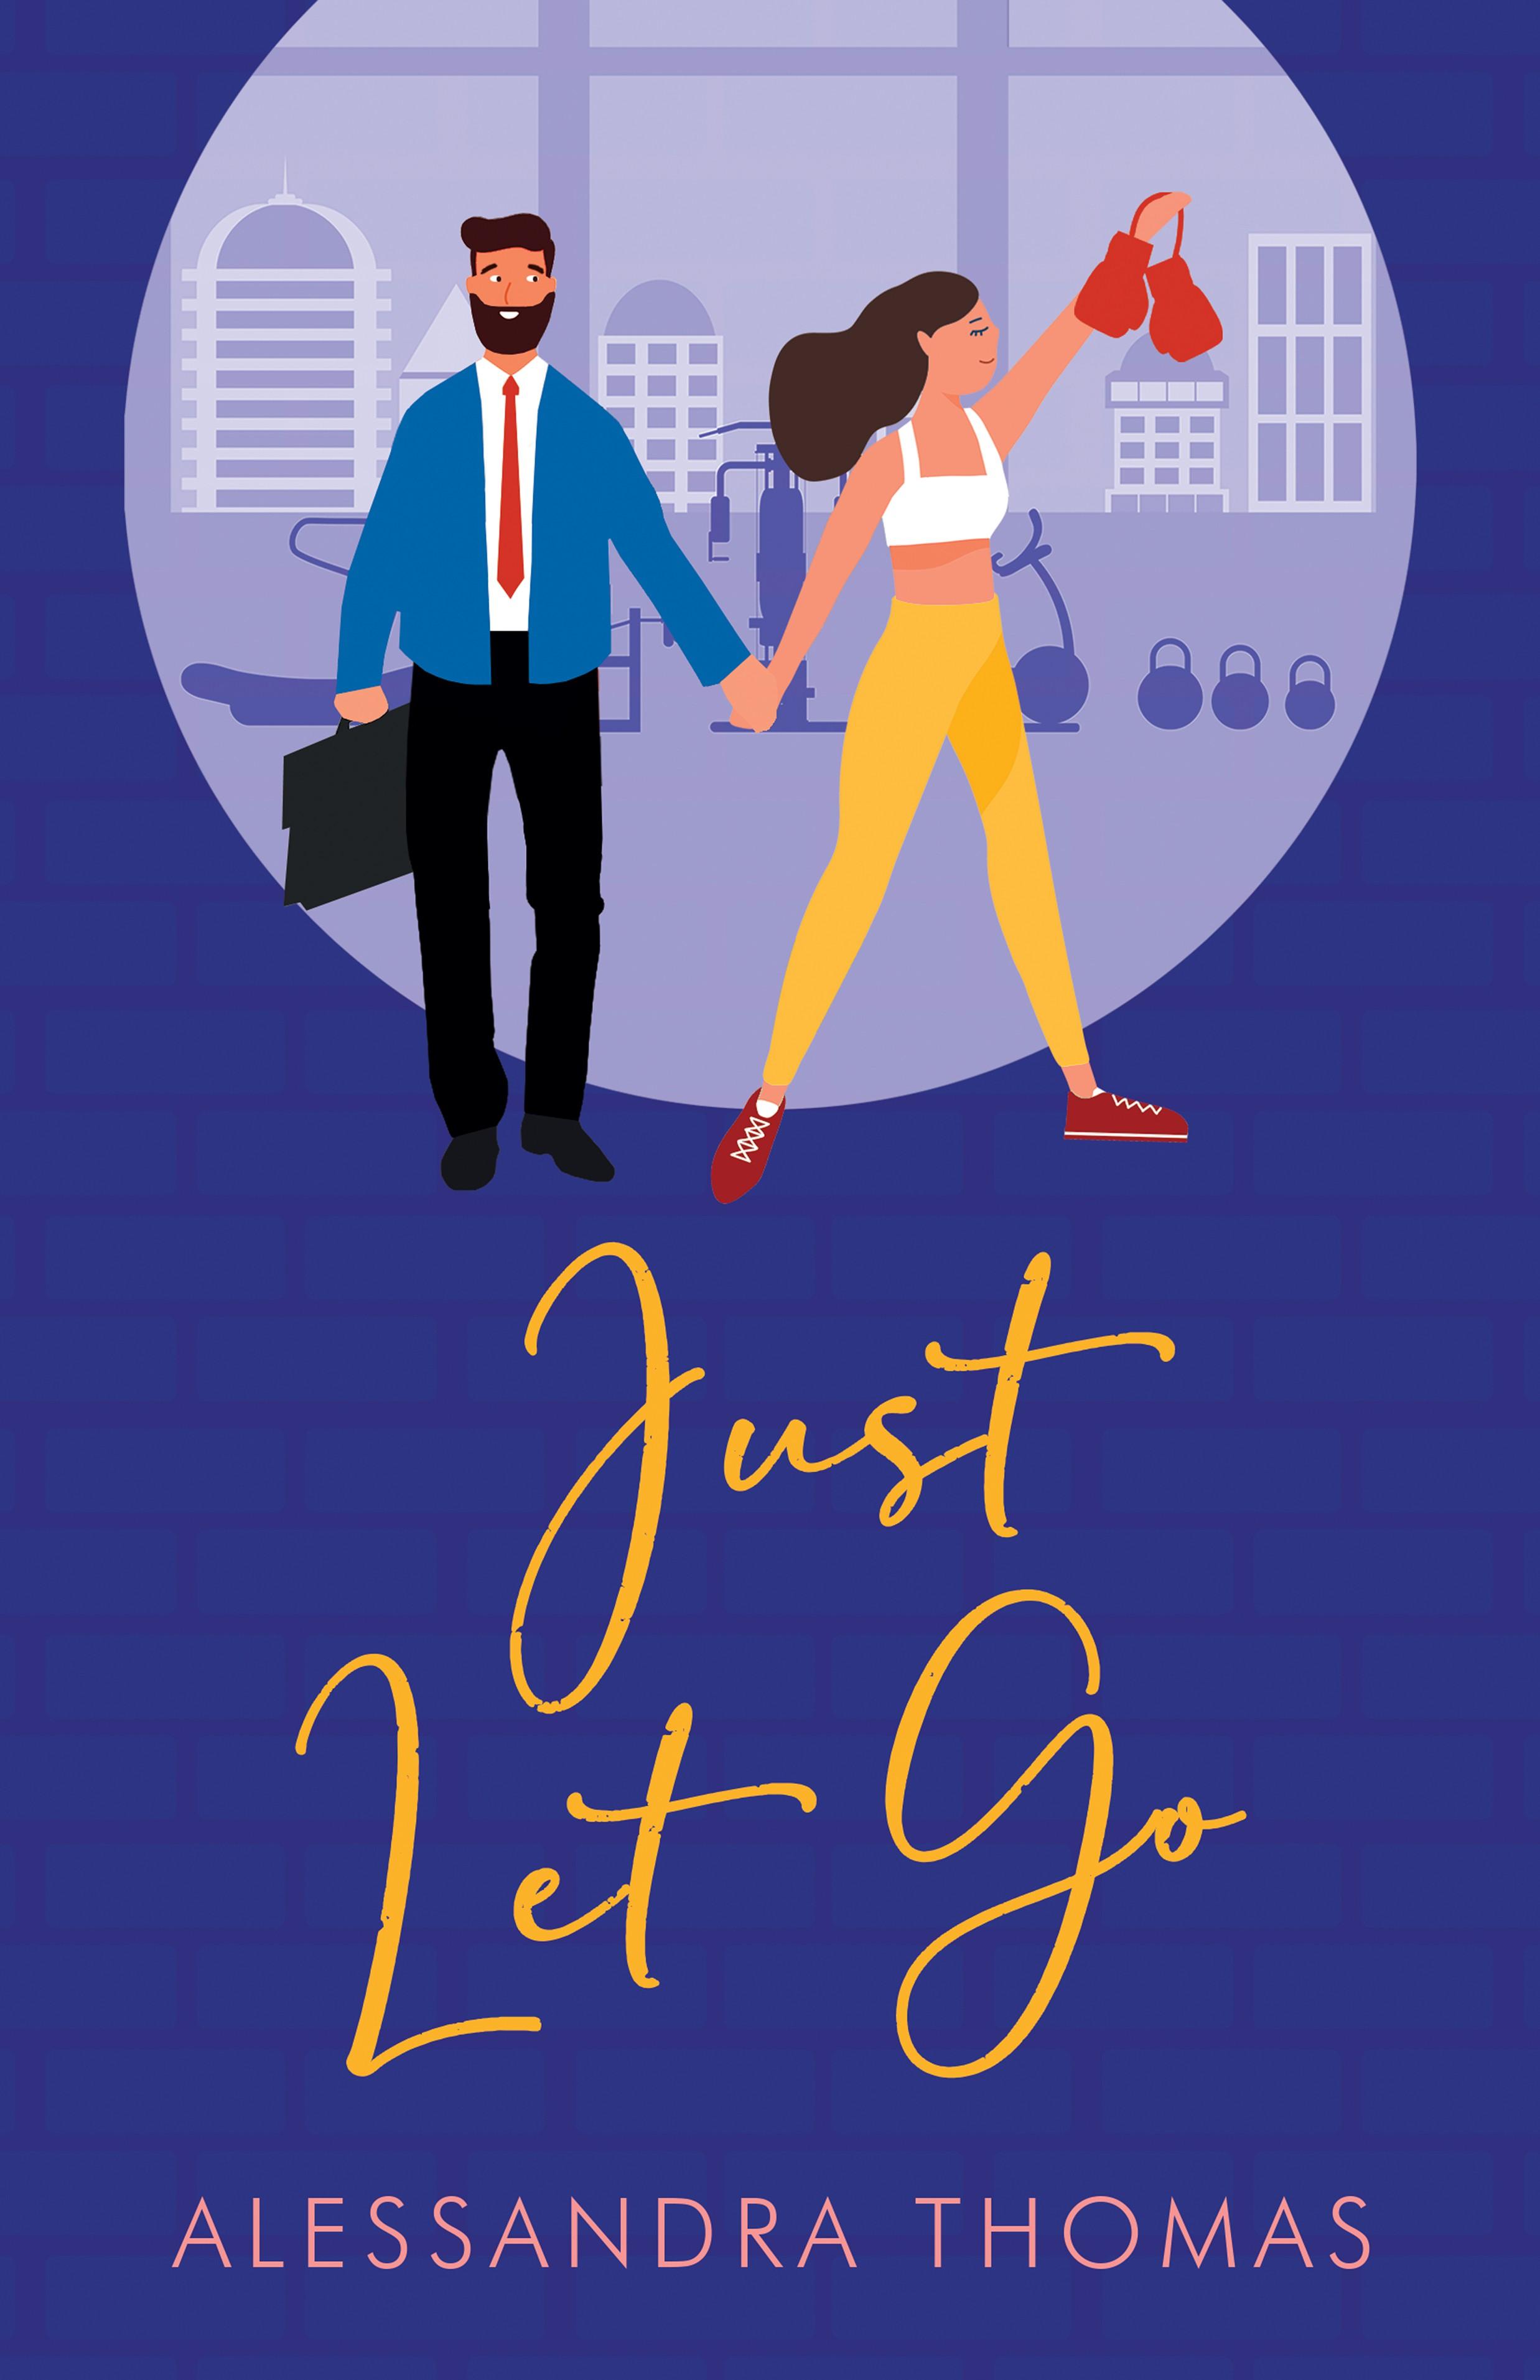 Romance/women's fiction book cover